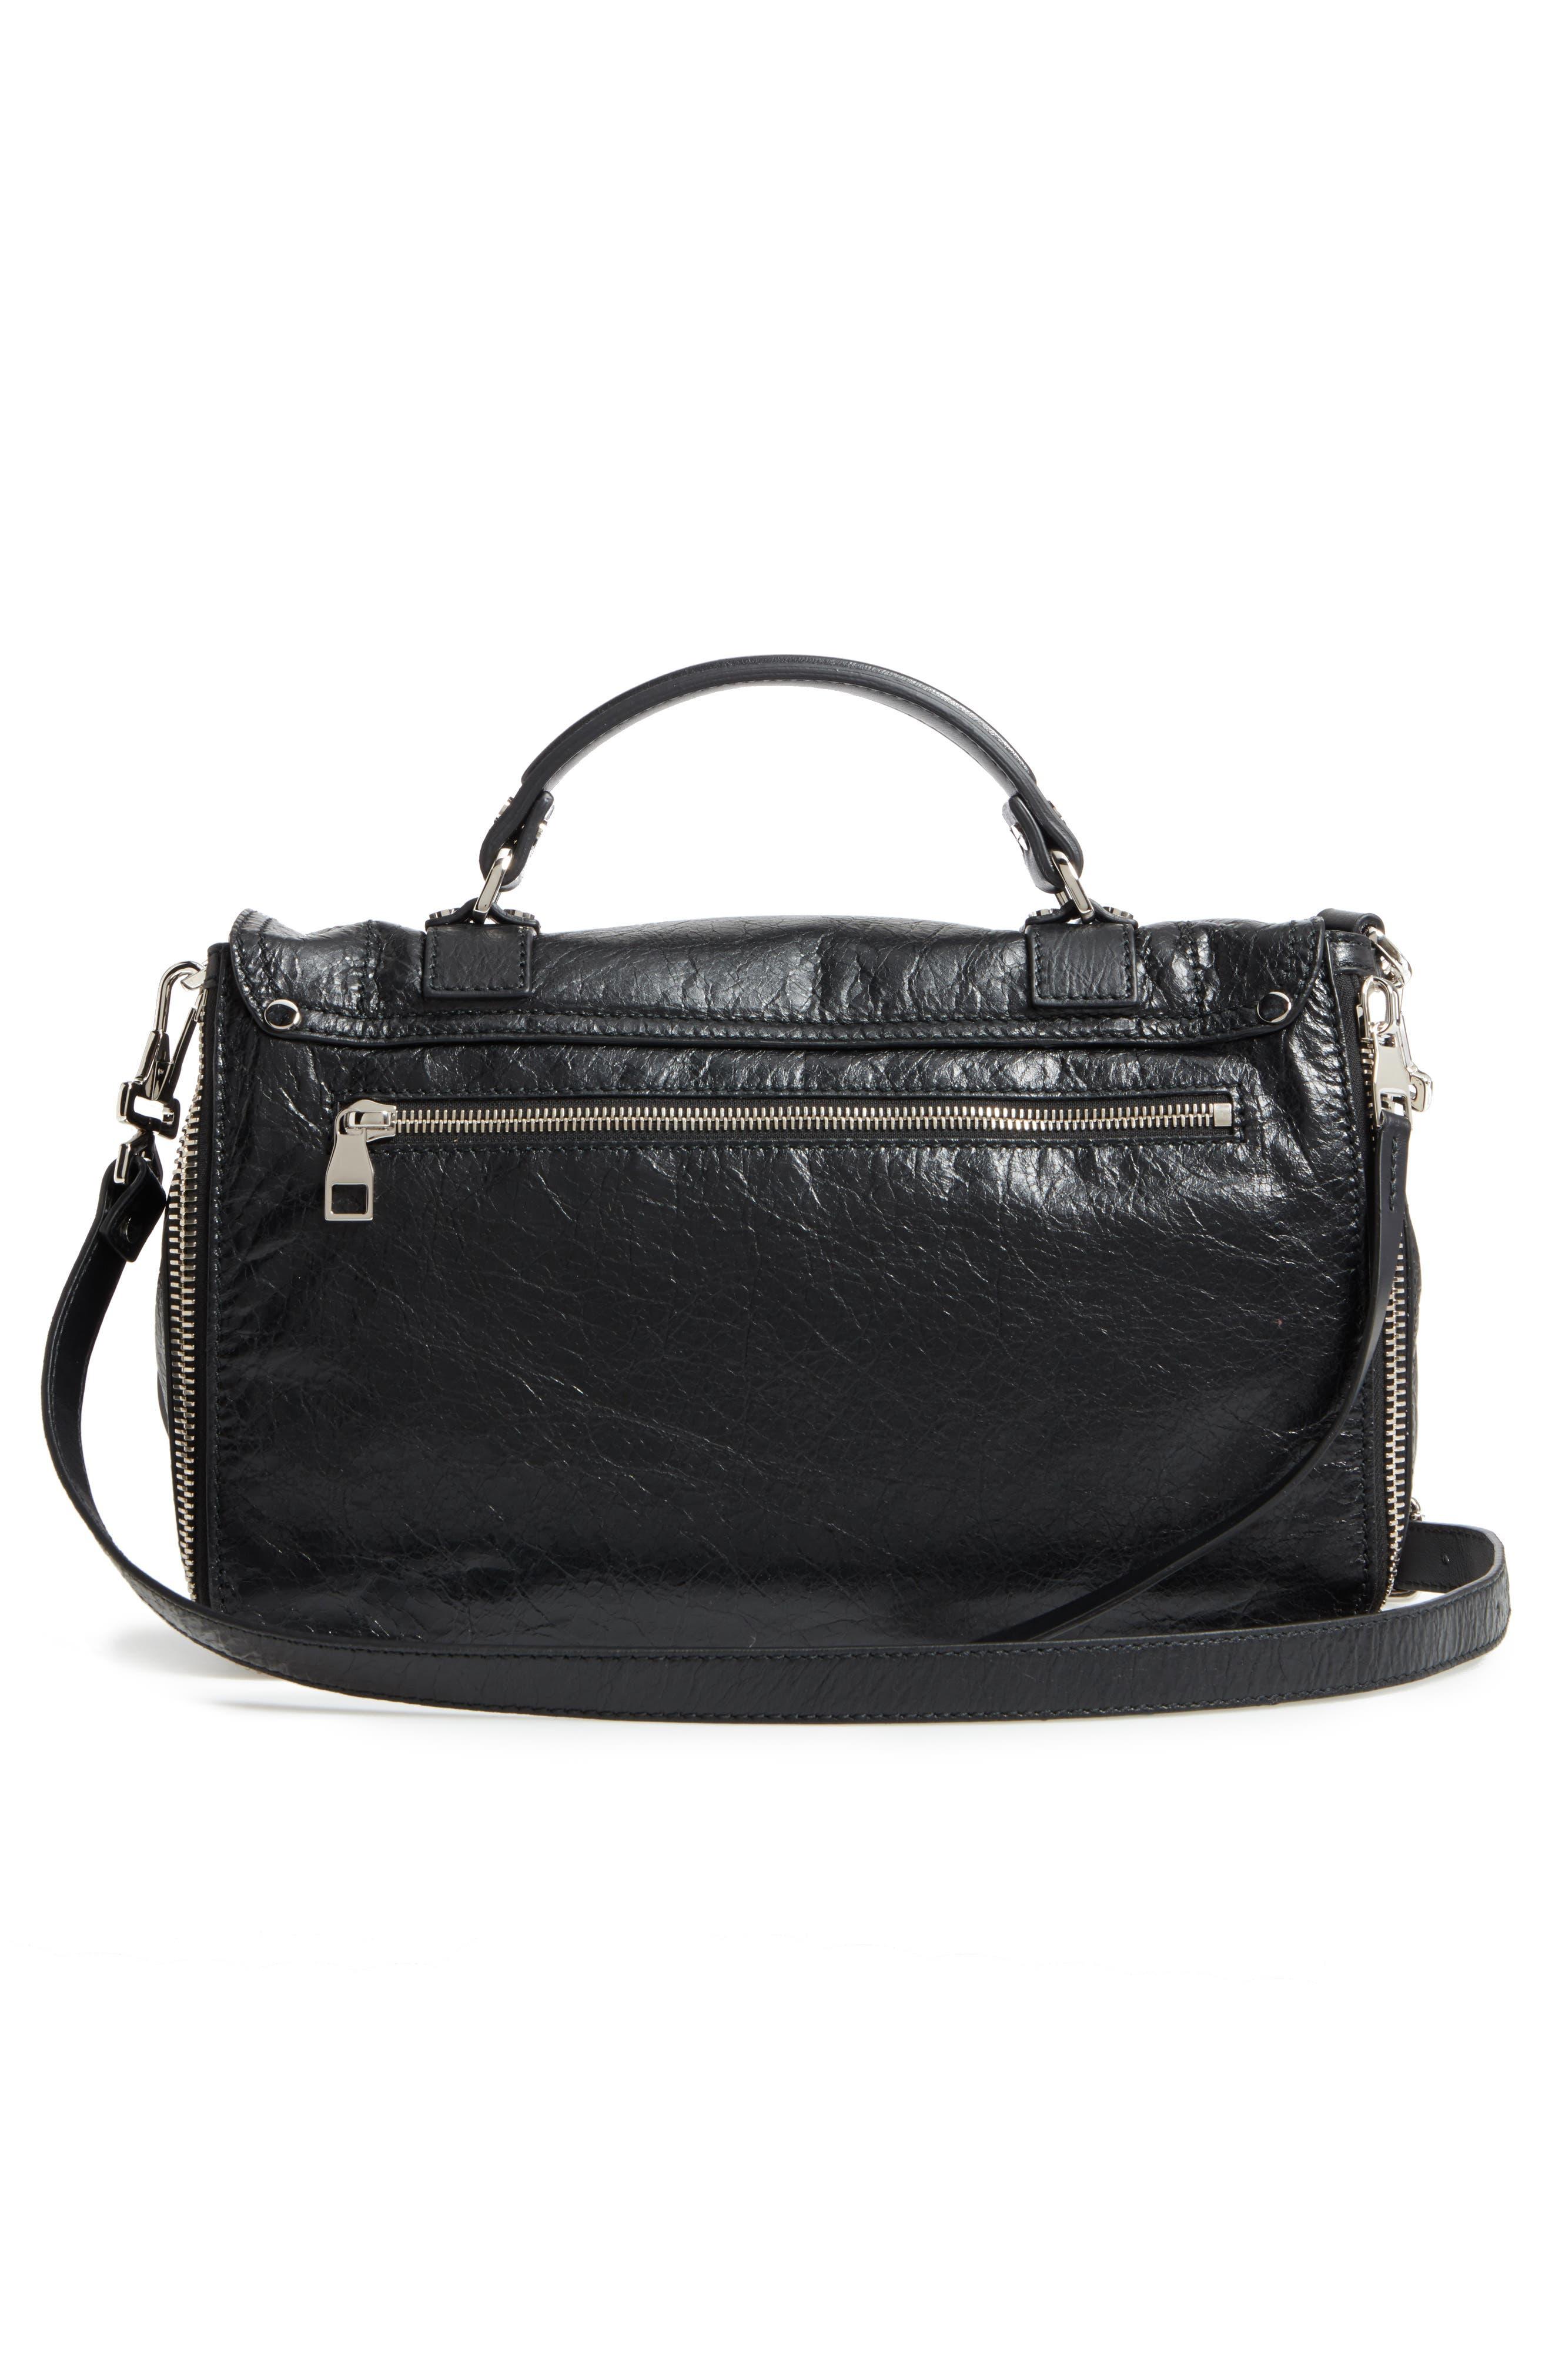 Medium PS1 Paper Leather Satchel,                             Alternate thumbnail 3, color,                             BLACK